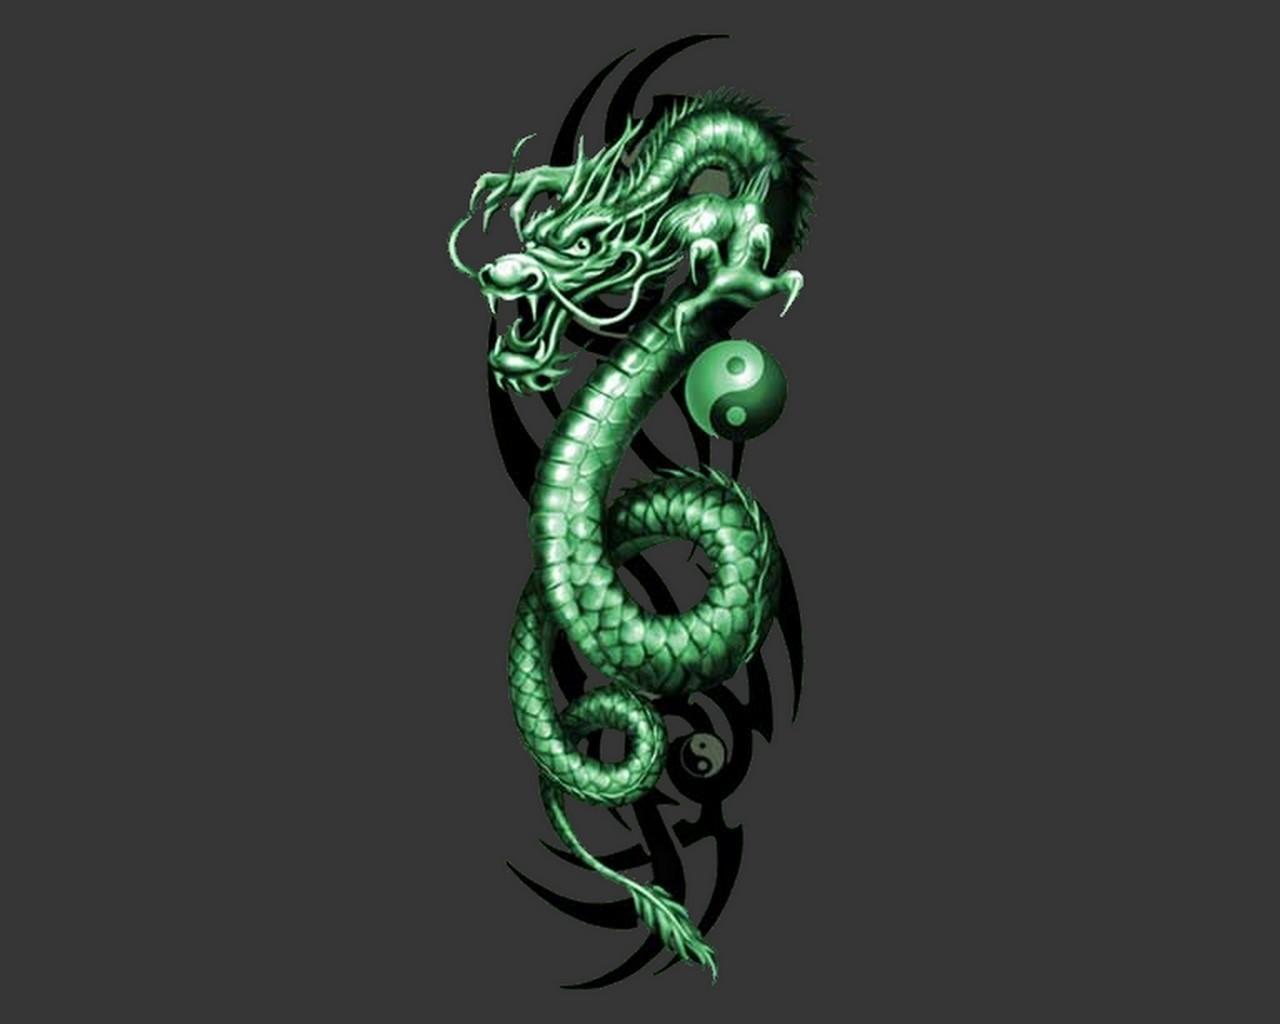 free download dragon backgrounds | pixelstalk